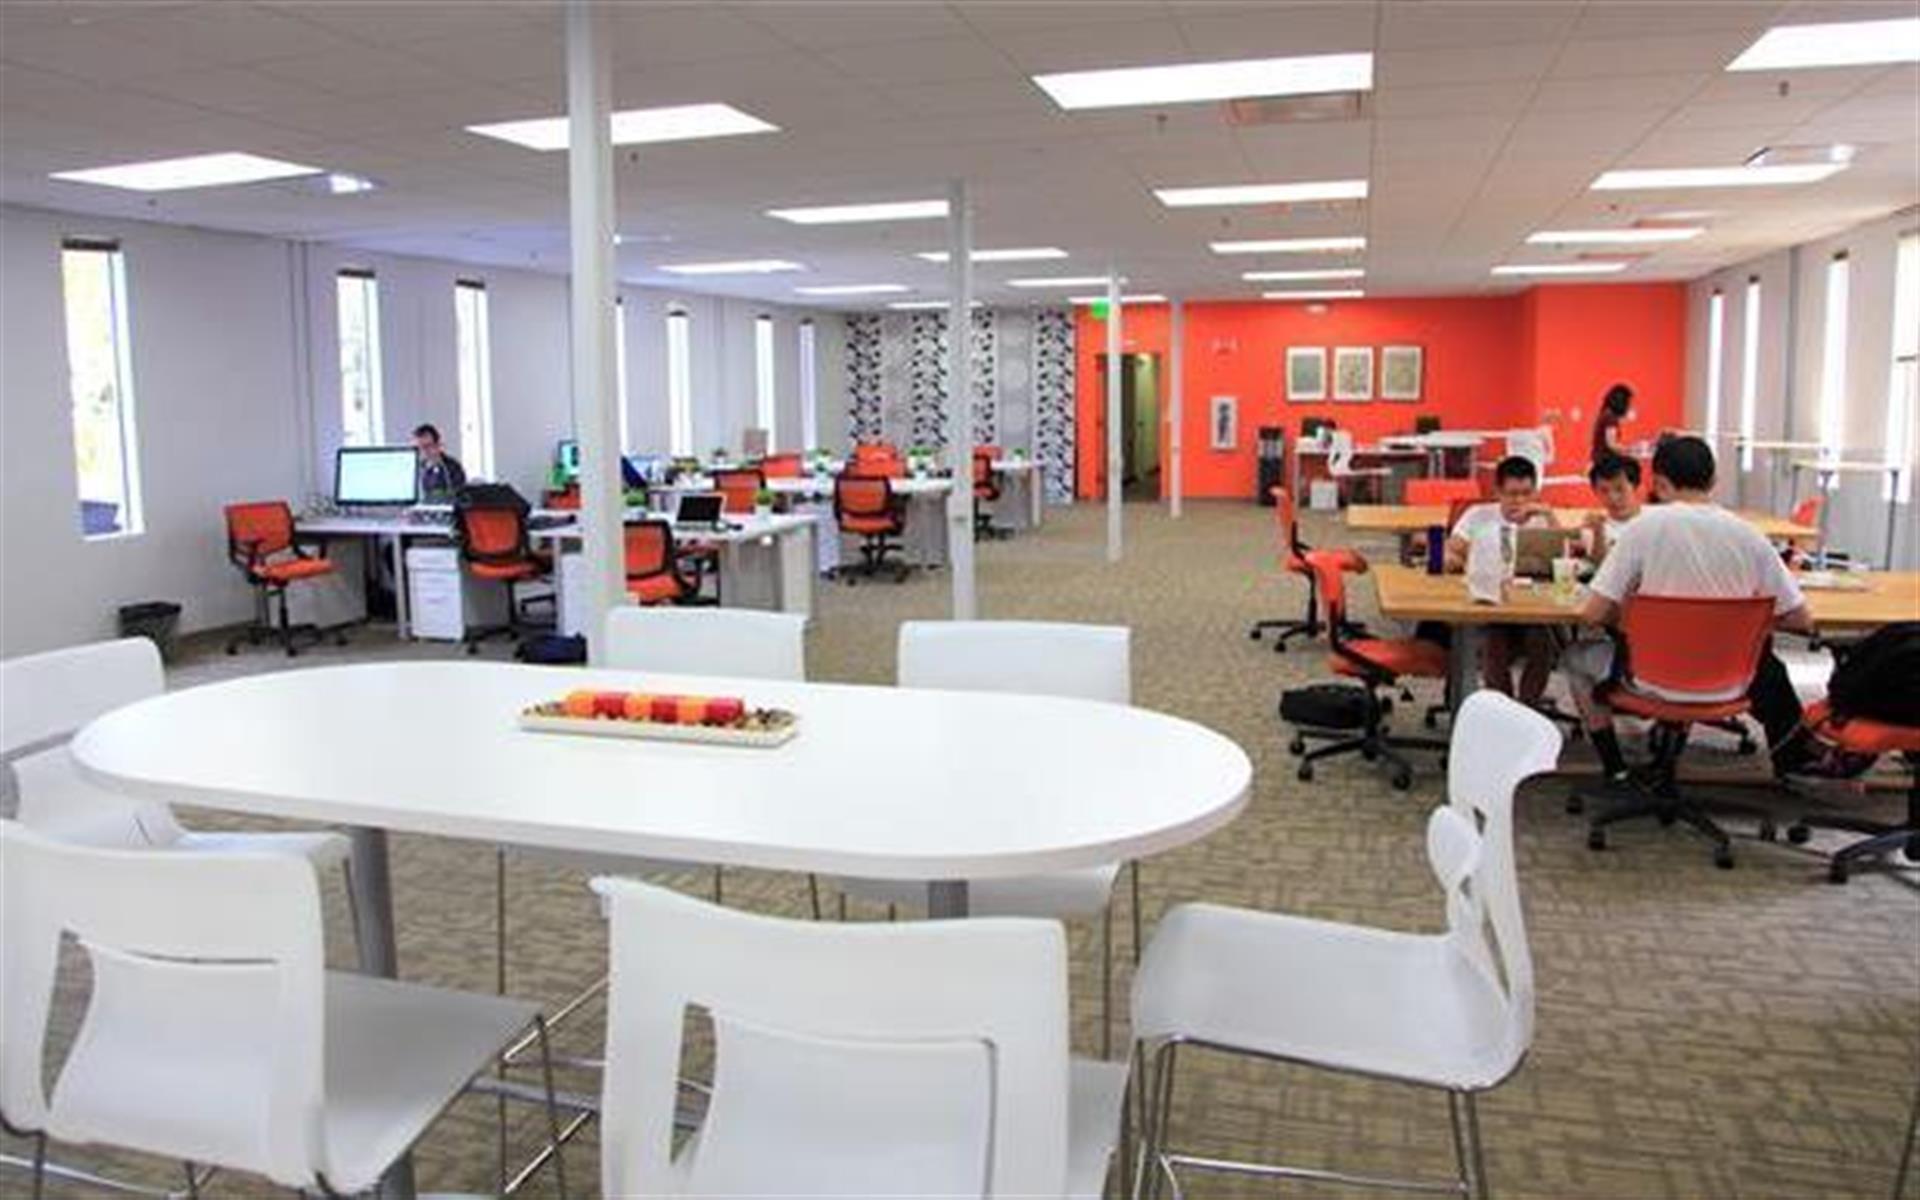 Enerspace Coworking - Full Time Coworking